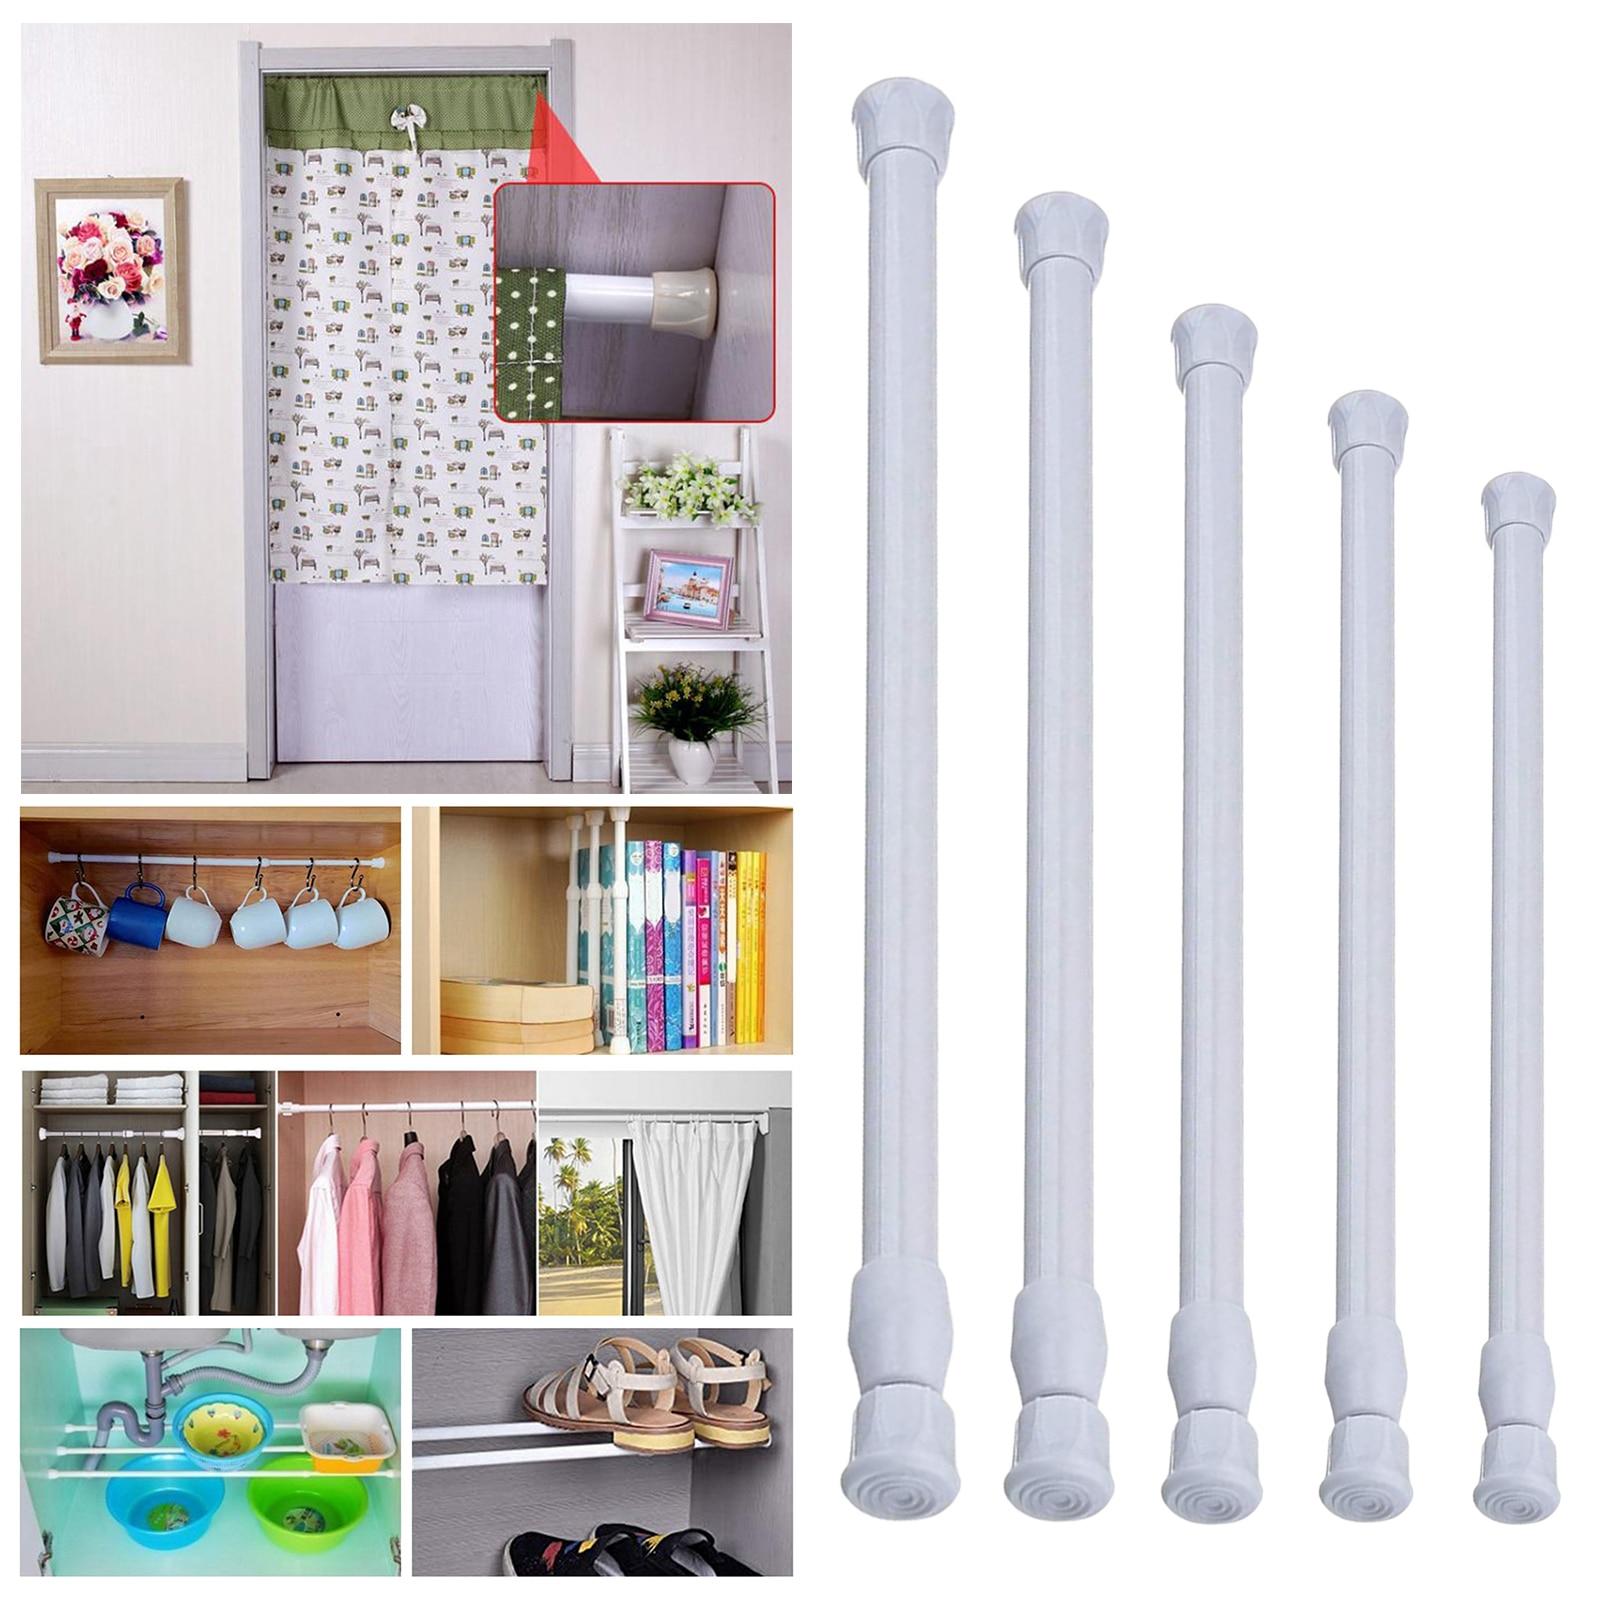 Telescoping Curtain Rods Adjustable Bar for Bathroom Cupboard Wardrobe White